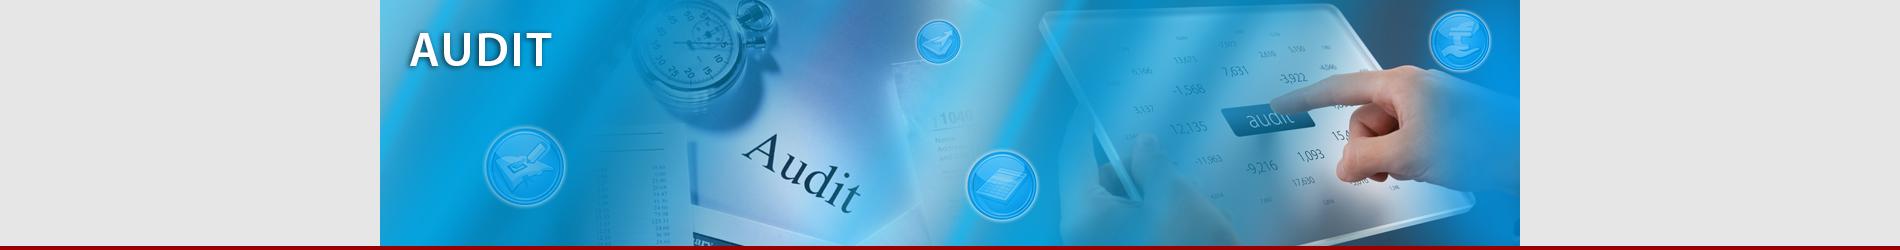 banner_site_individual_audit